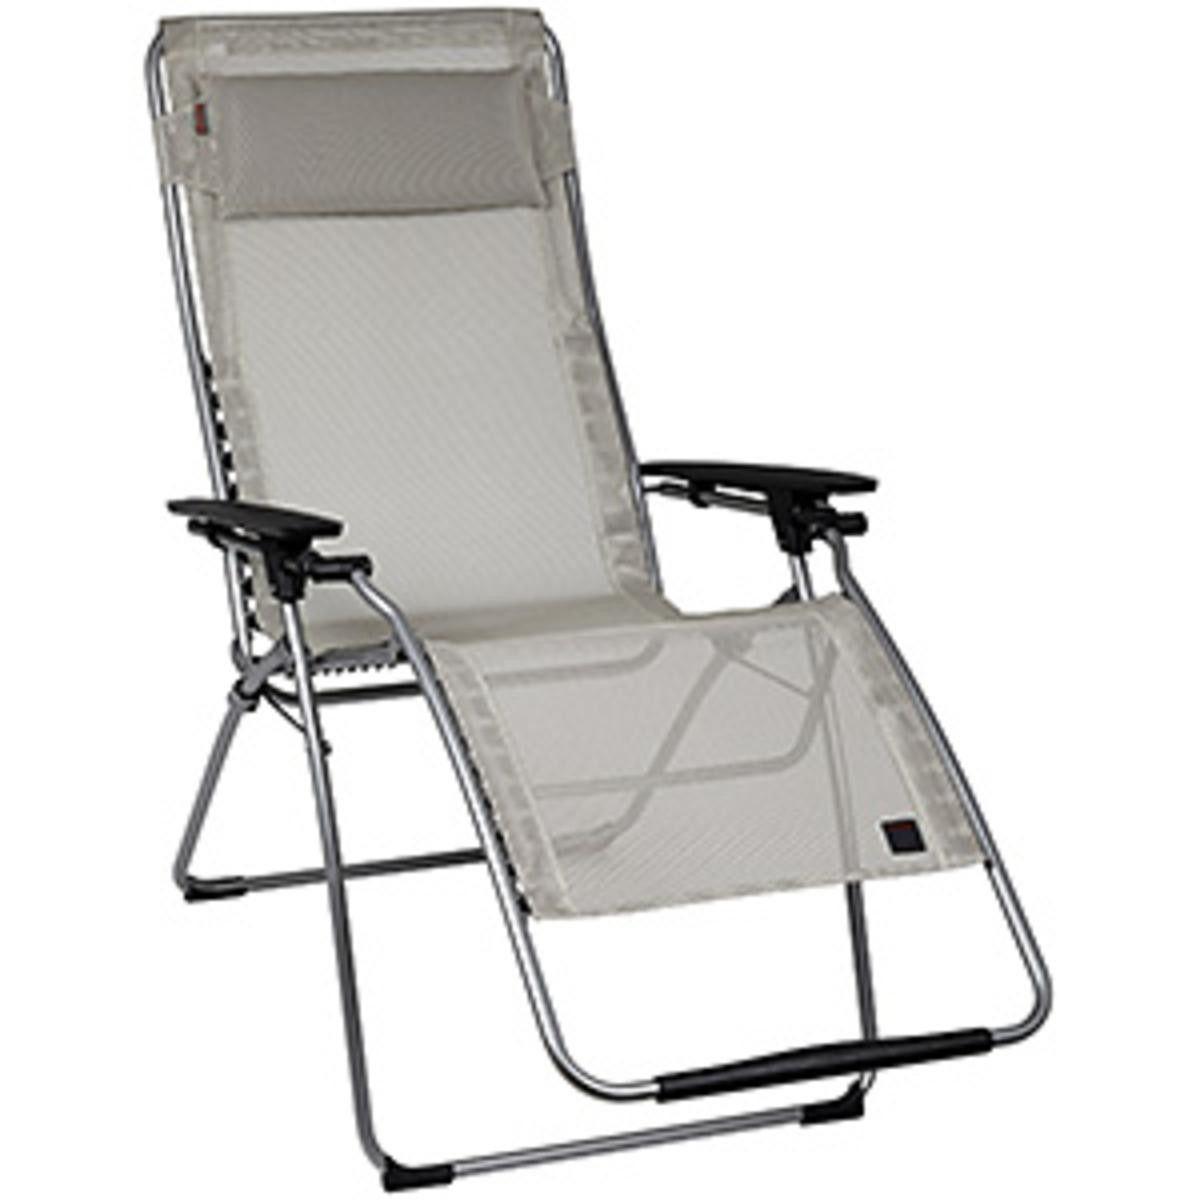 Futura Clipper XL MESH Zero Gravity Recliner   Seigle With Grey Frame    Travel Reflexology Chair